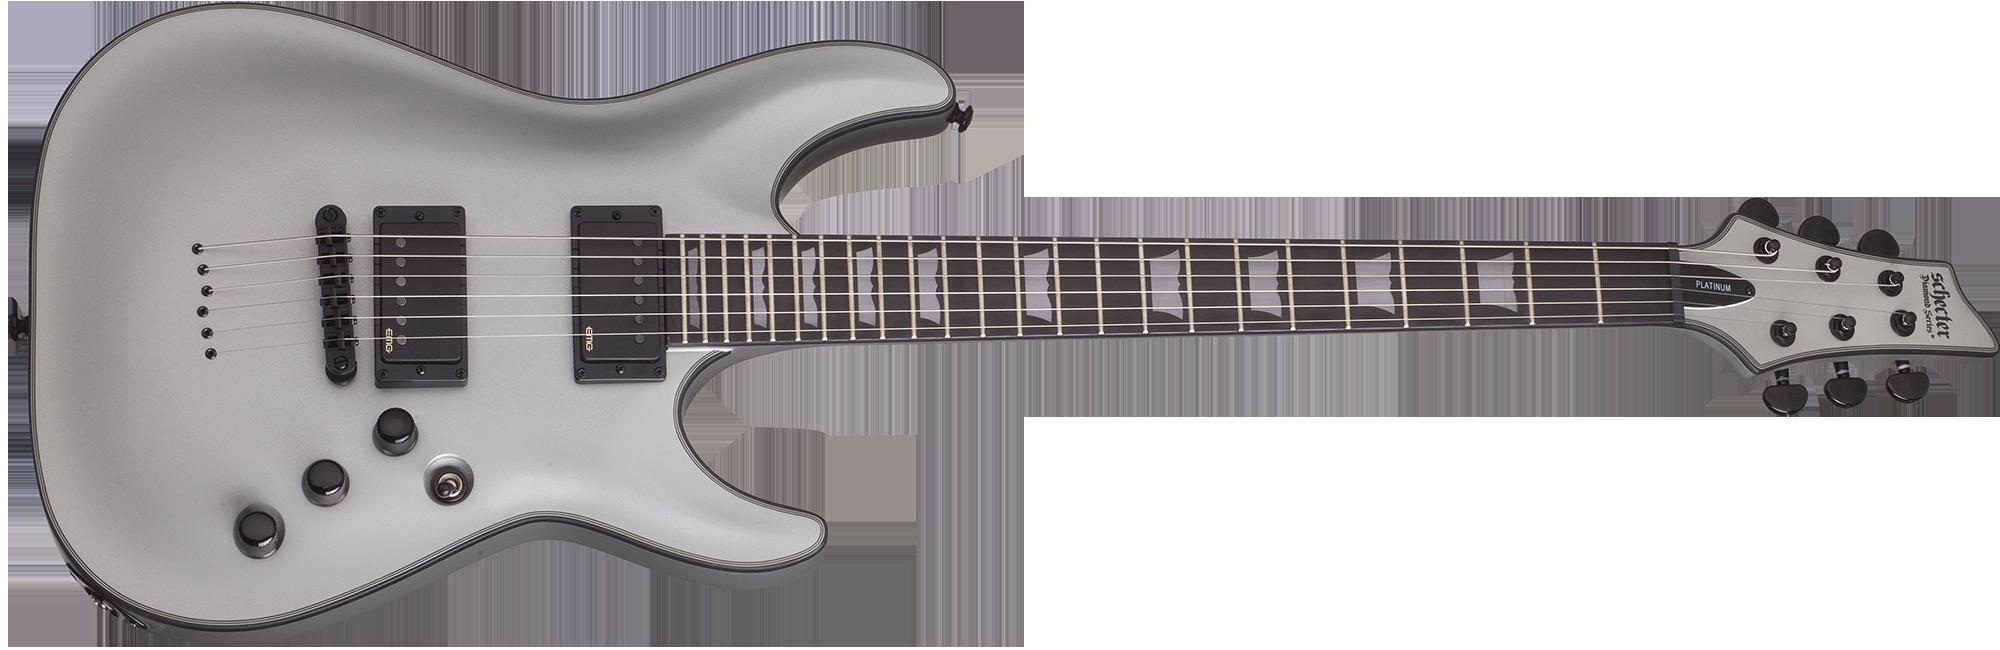 C-1 Platinum Satin Silver (SSV) SKU #811